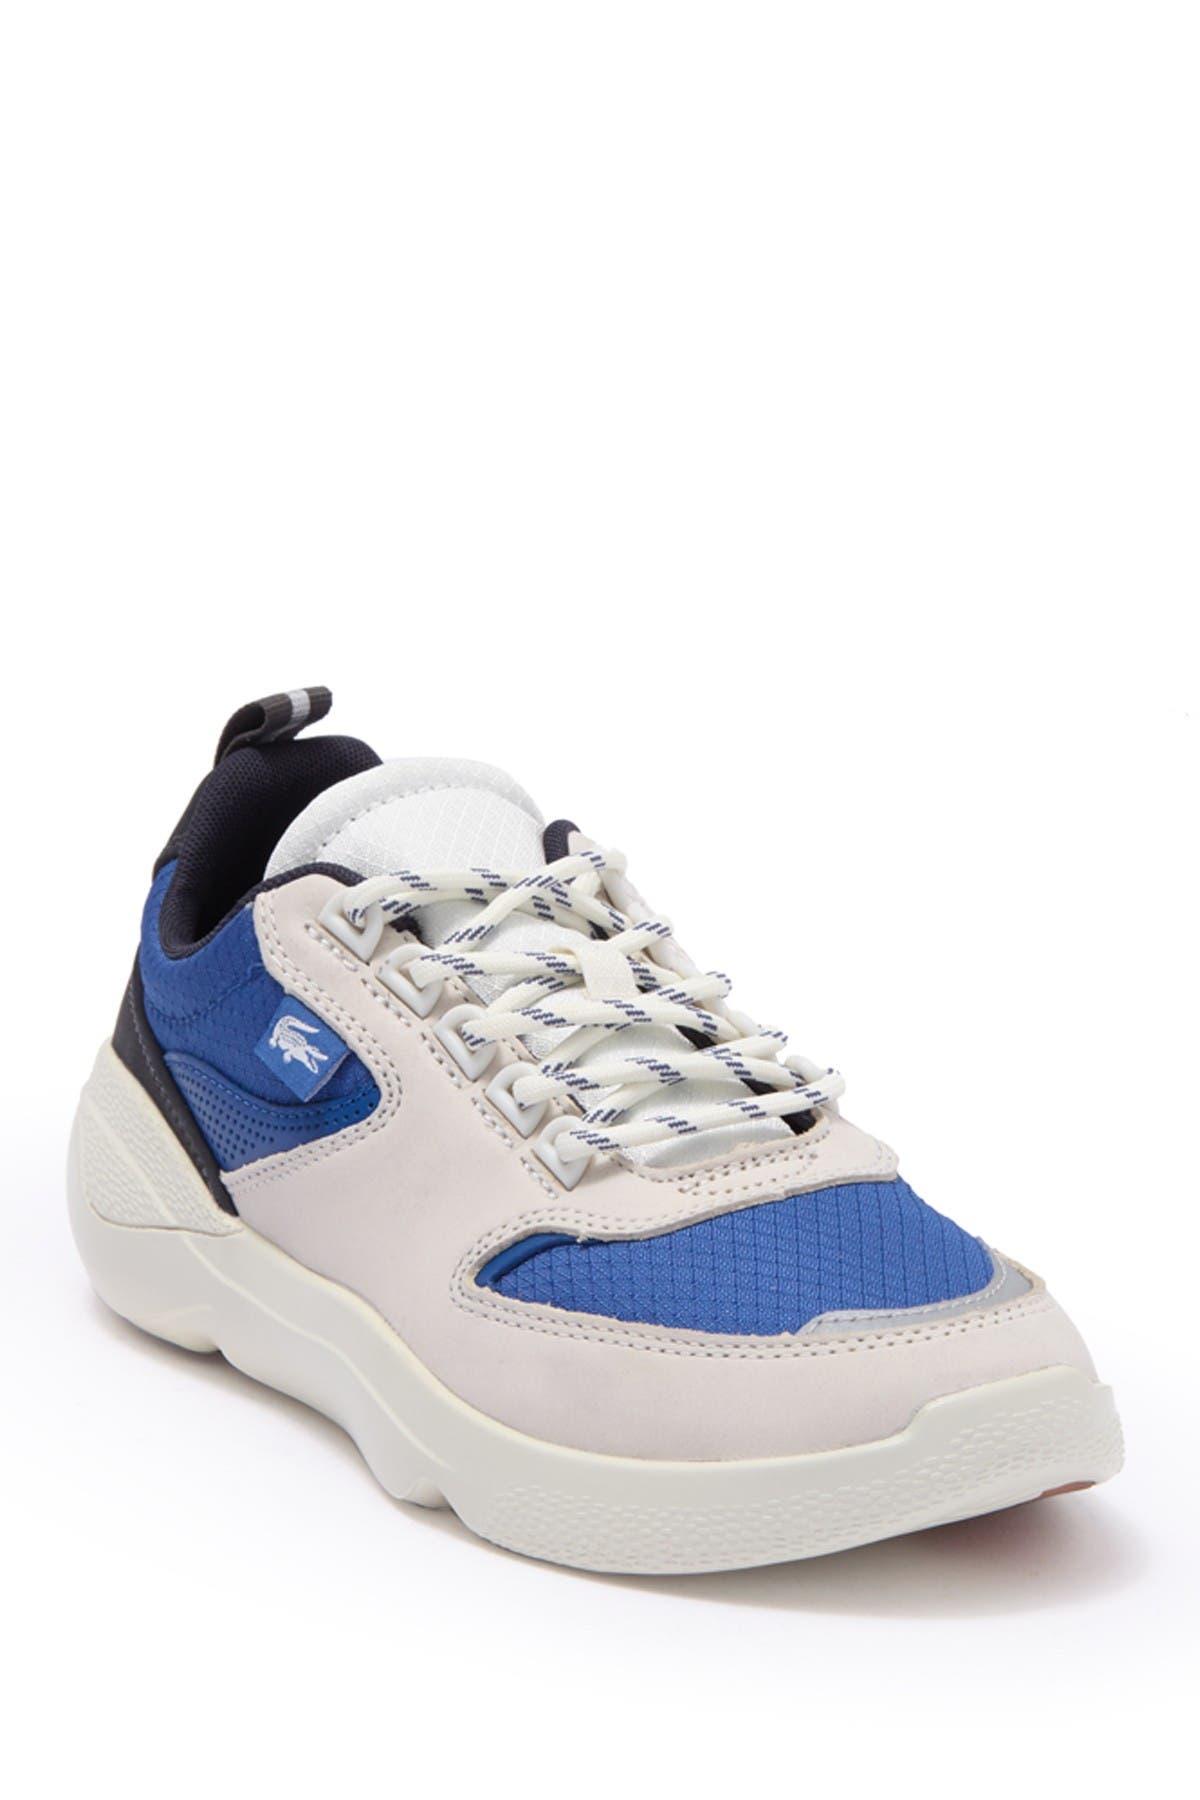 Image of Lacoste Wildcard Sneaker